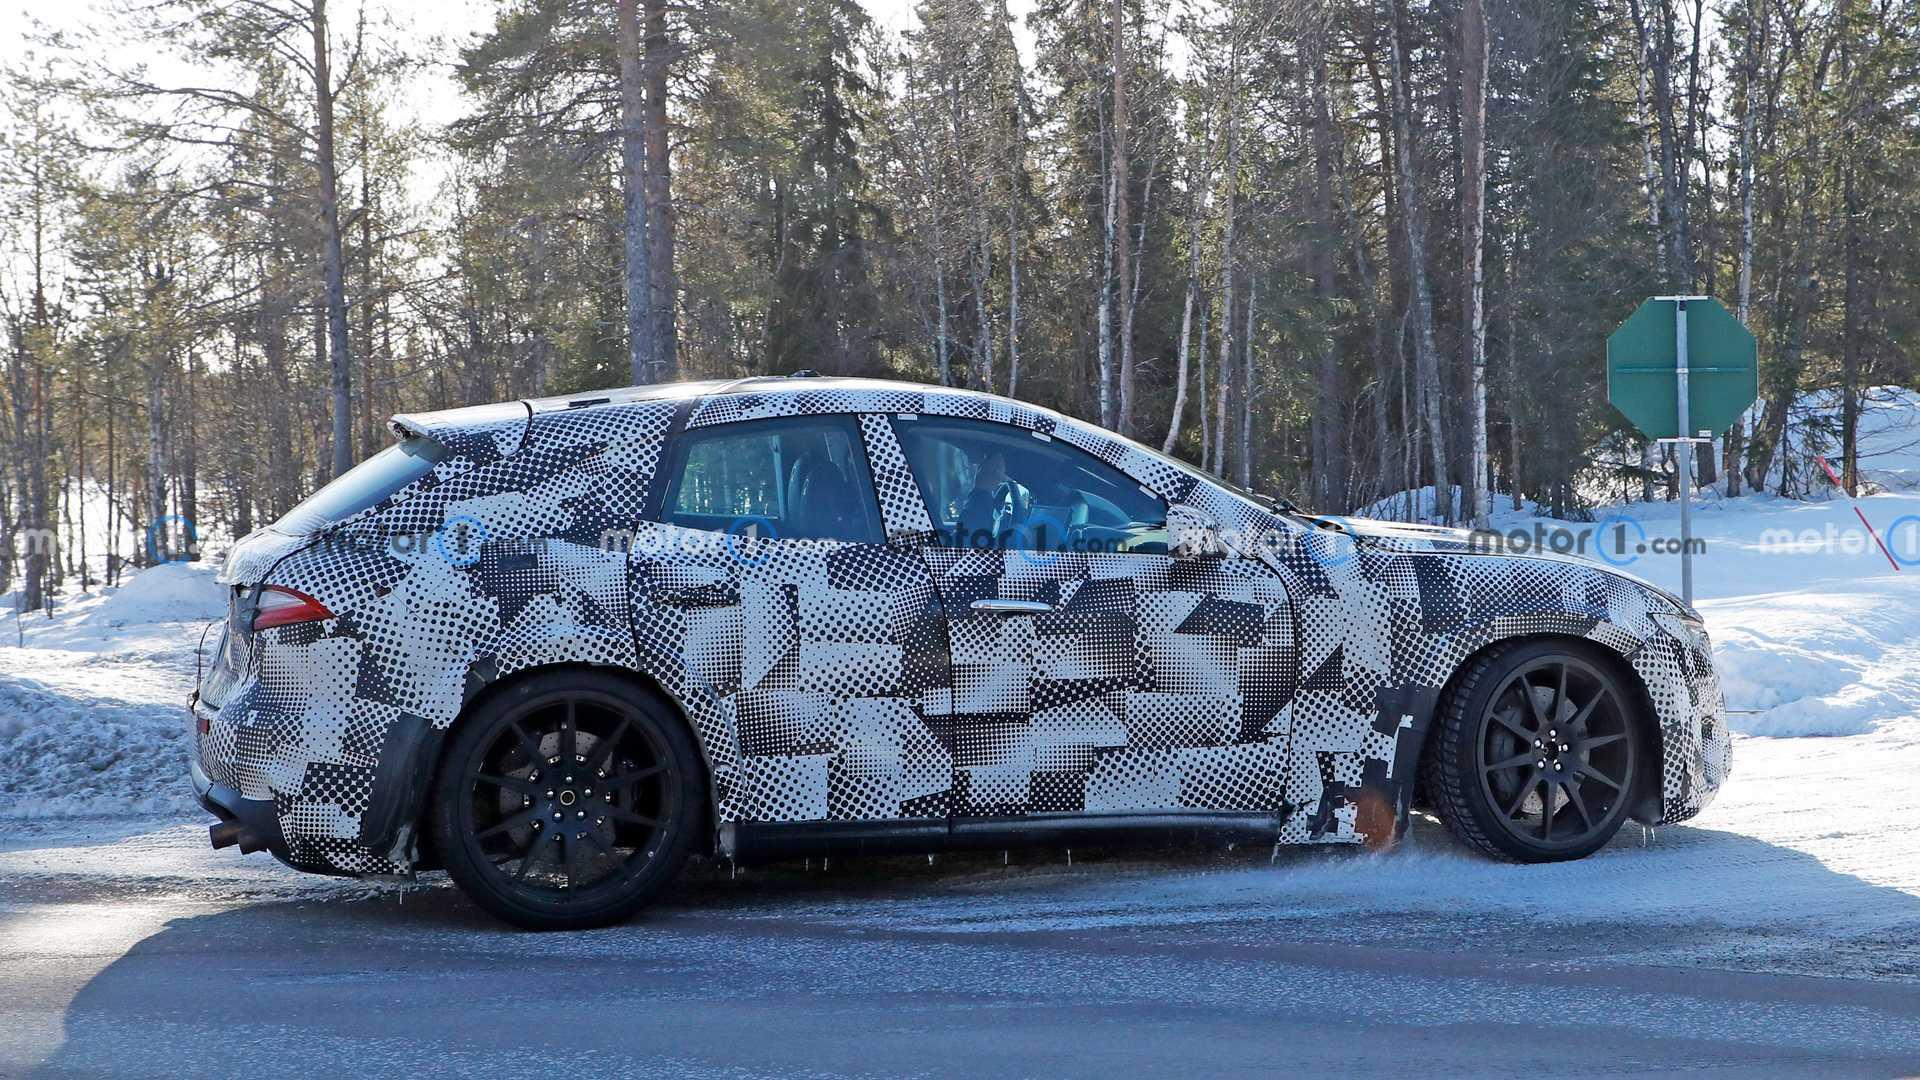 Ferrari Purosangue Mule Side View Spy Photo